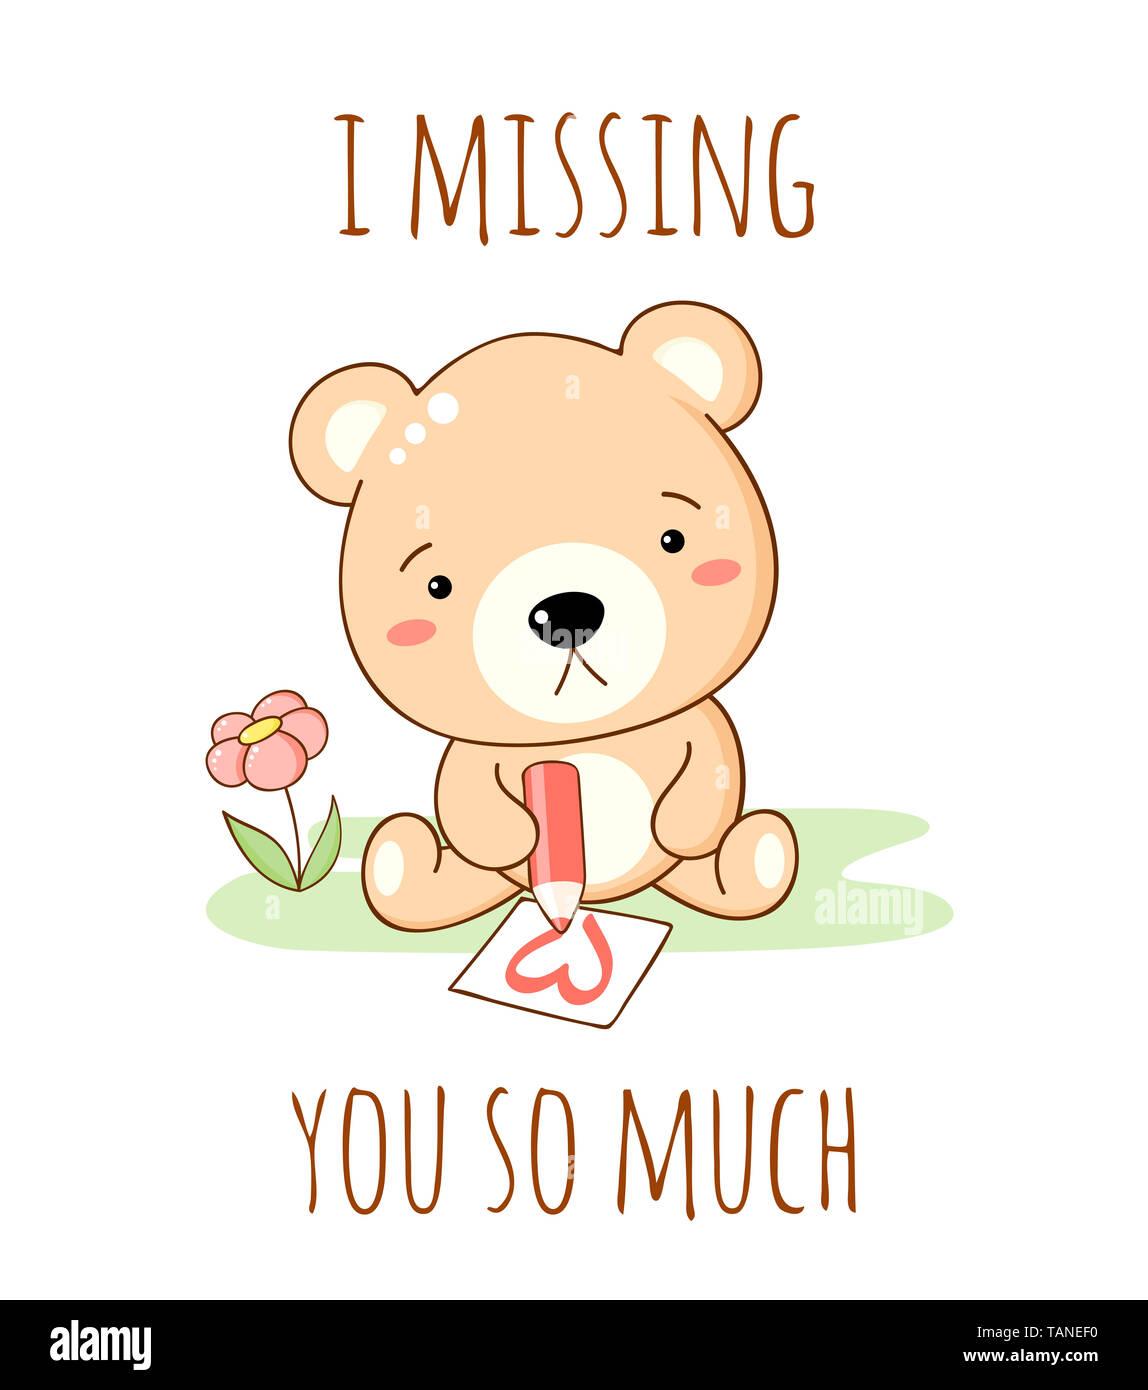 vermisse dich so sehr